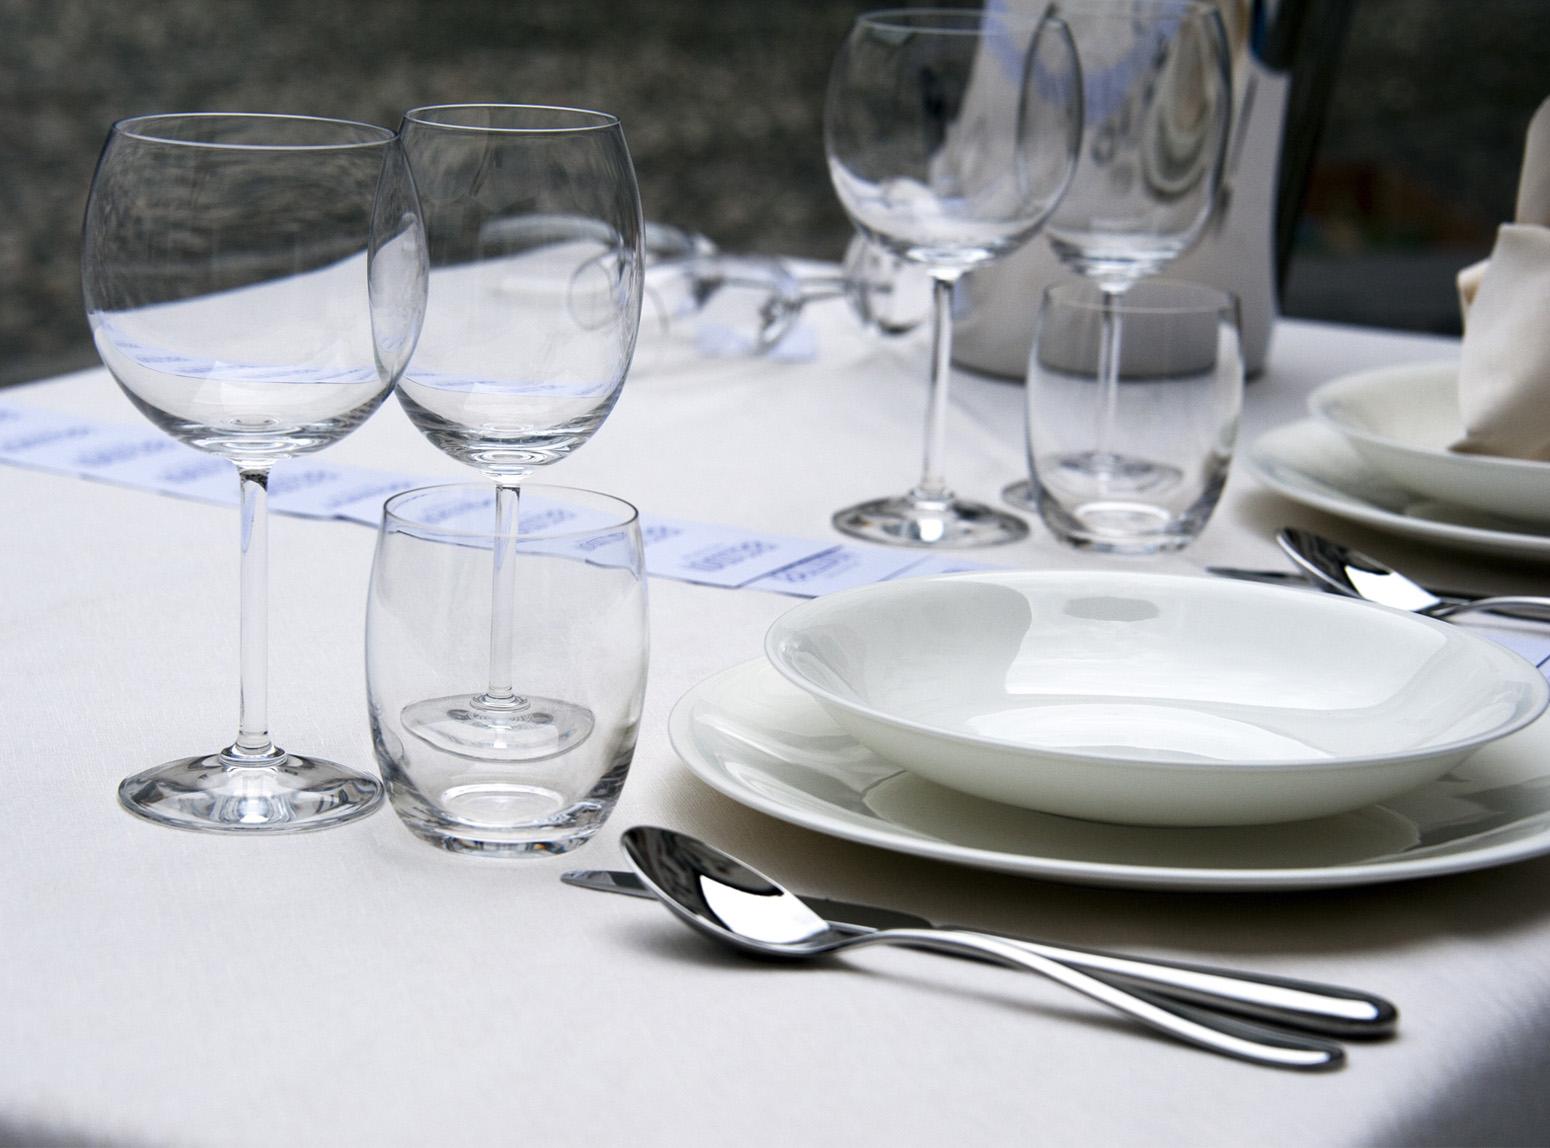 ... banquet furniture 4b19aed0a